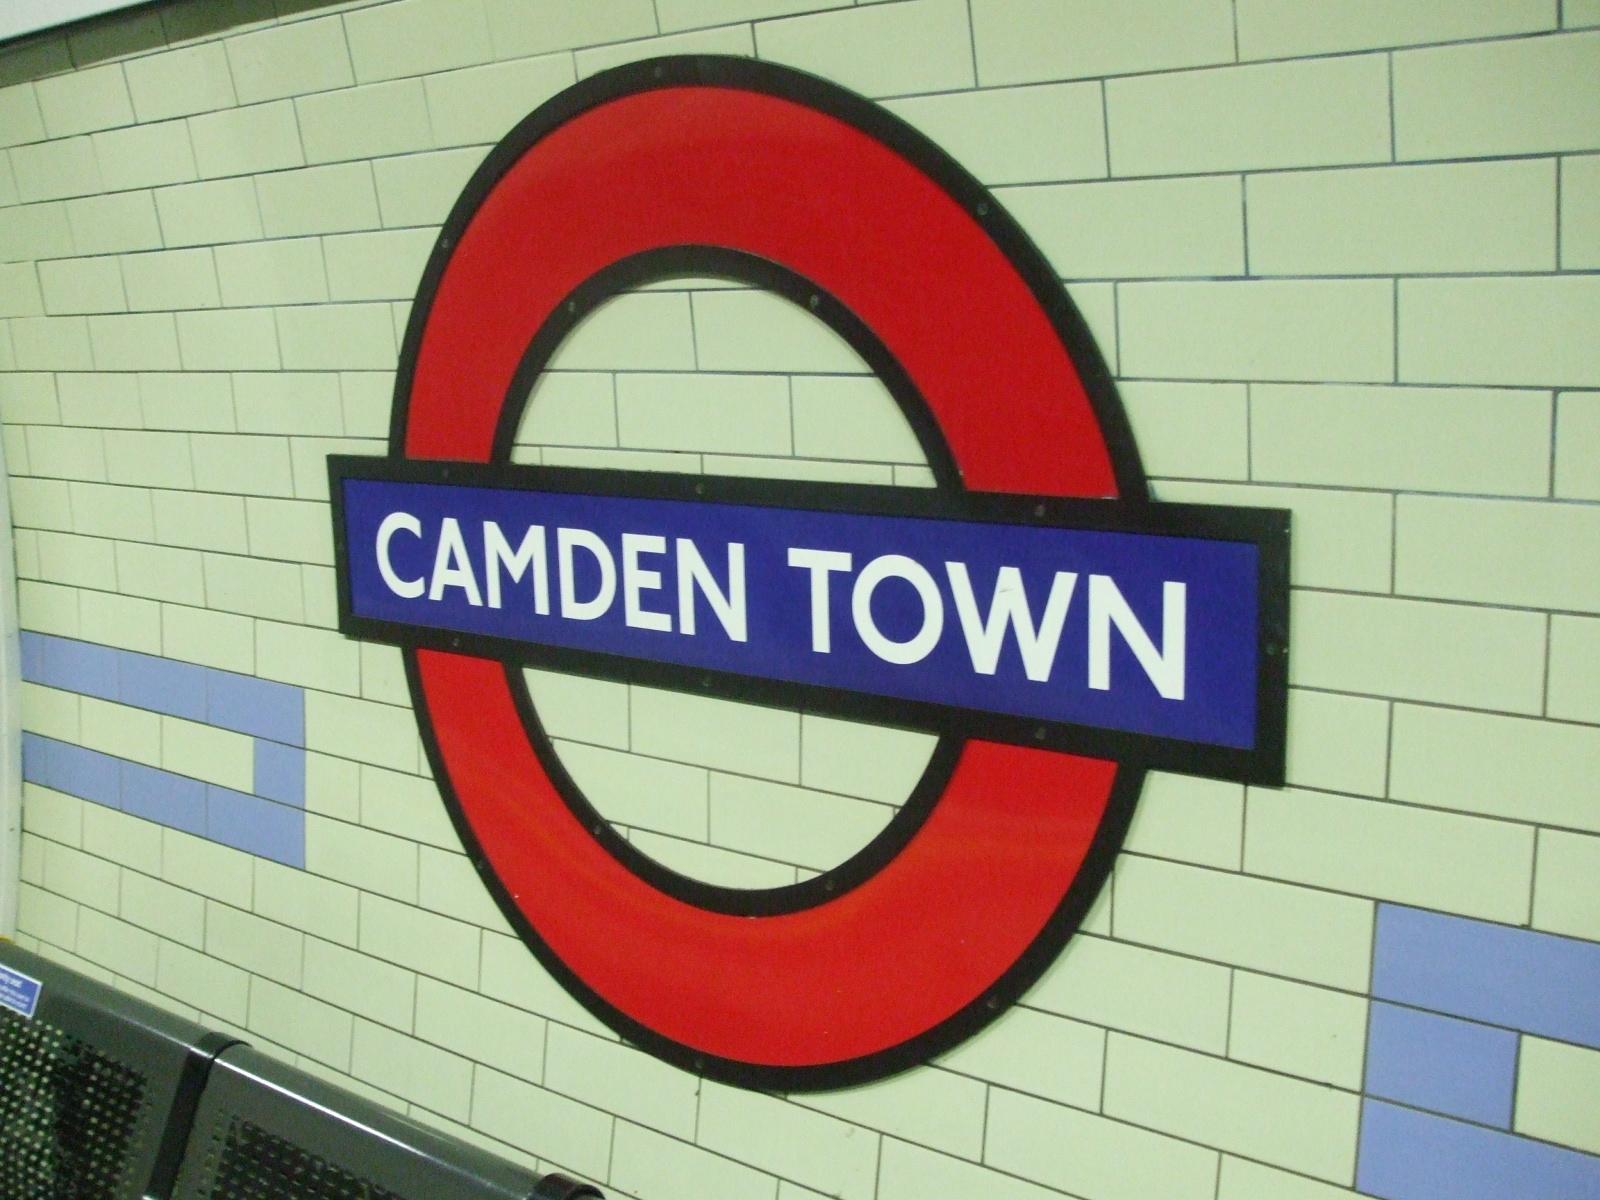 Camden_Town_stn_roundel